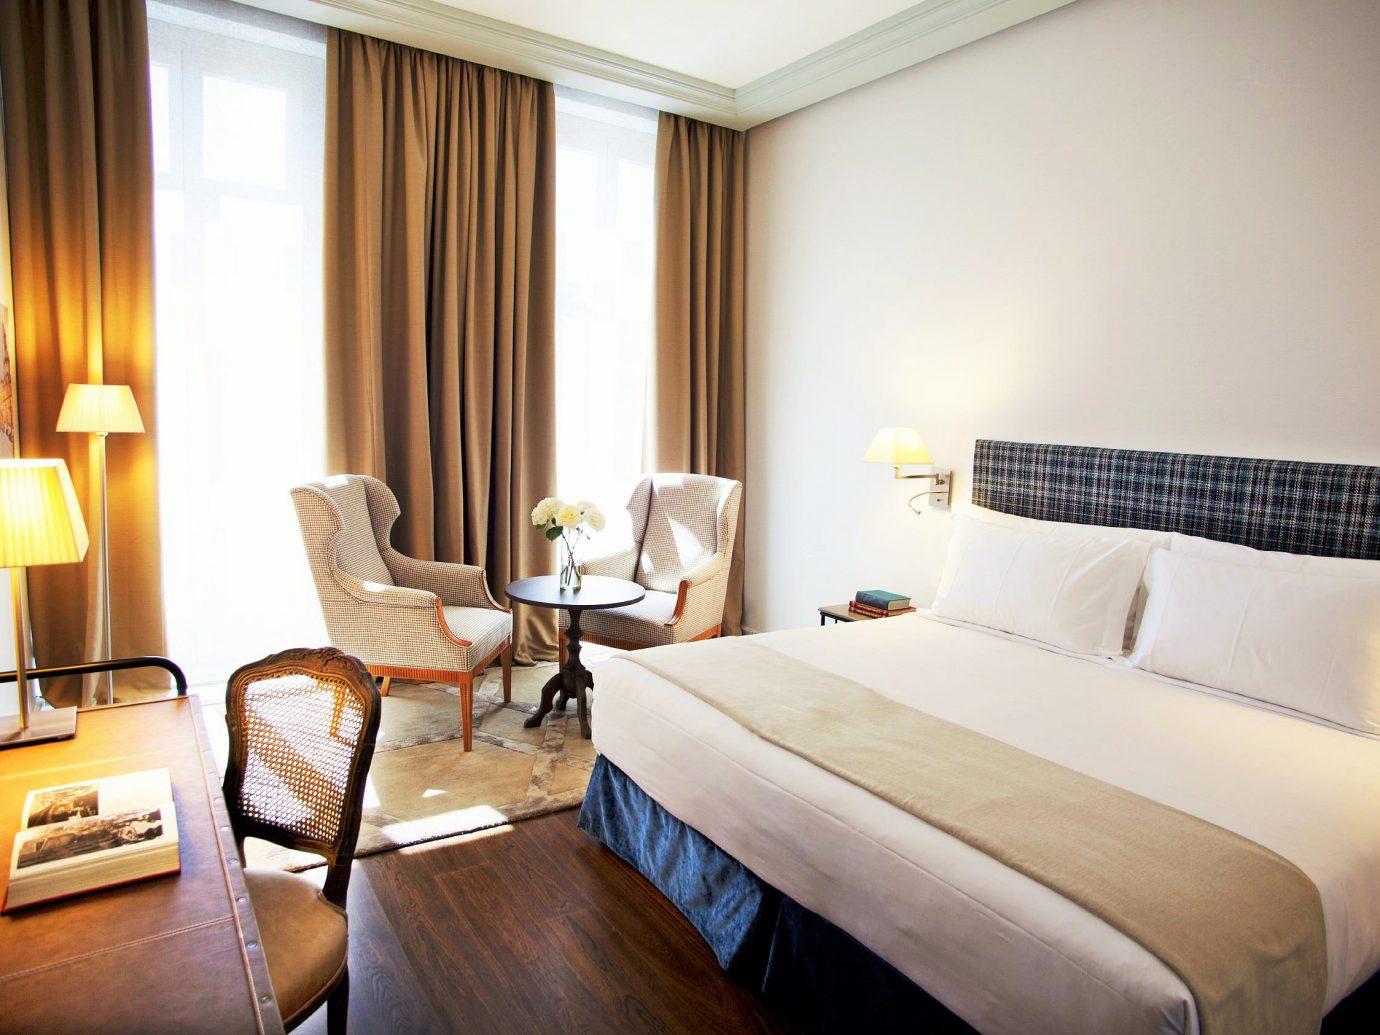 Bedroom Hotels Luxury Madrid Scenic views Spain Suite indoor wall bed room floor hotel sofa property window estate cottage real estate interior design condominium apartment lamp furniture